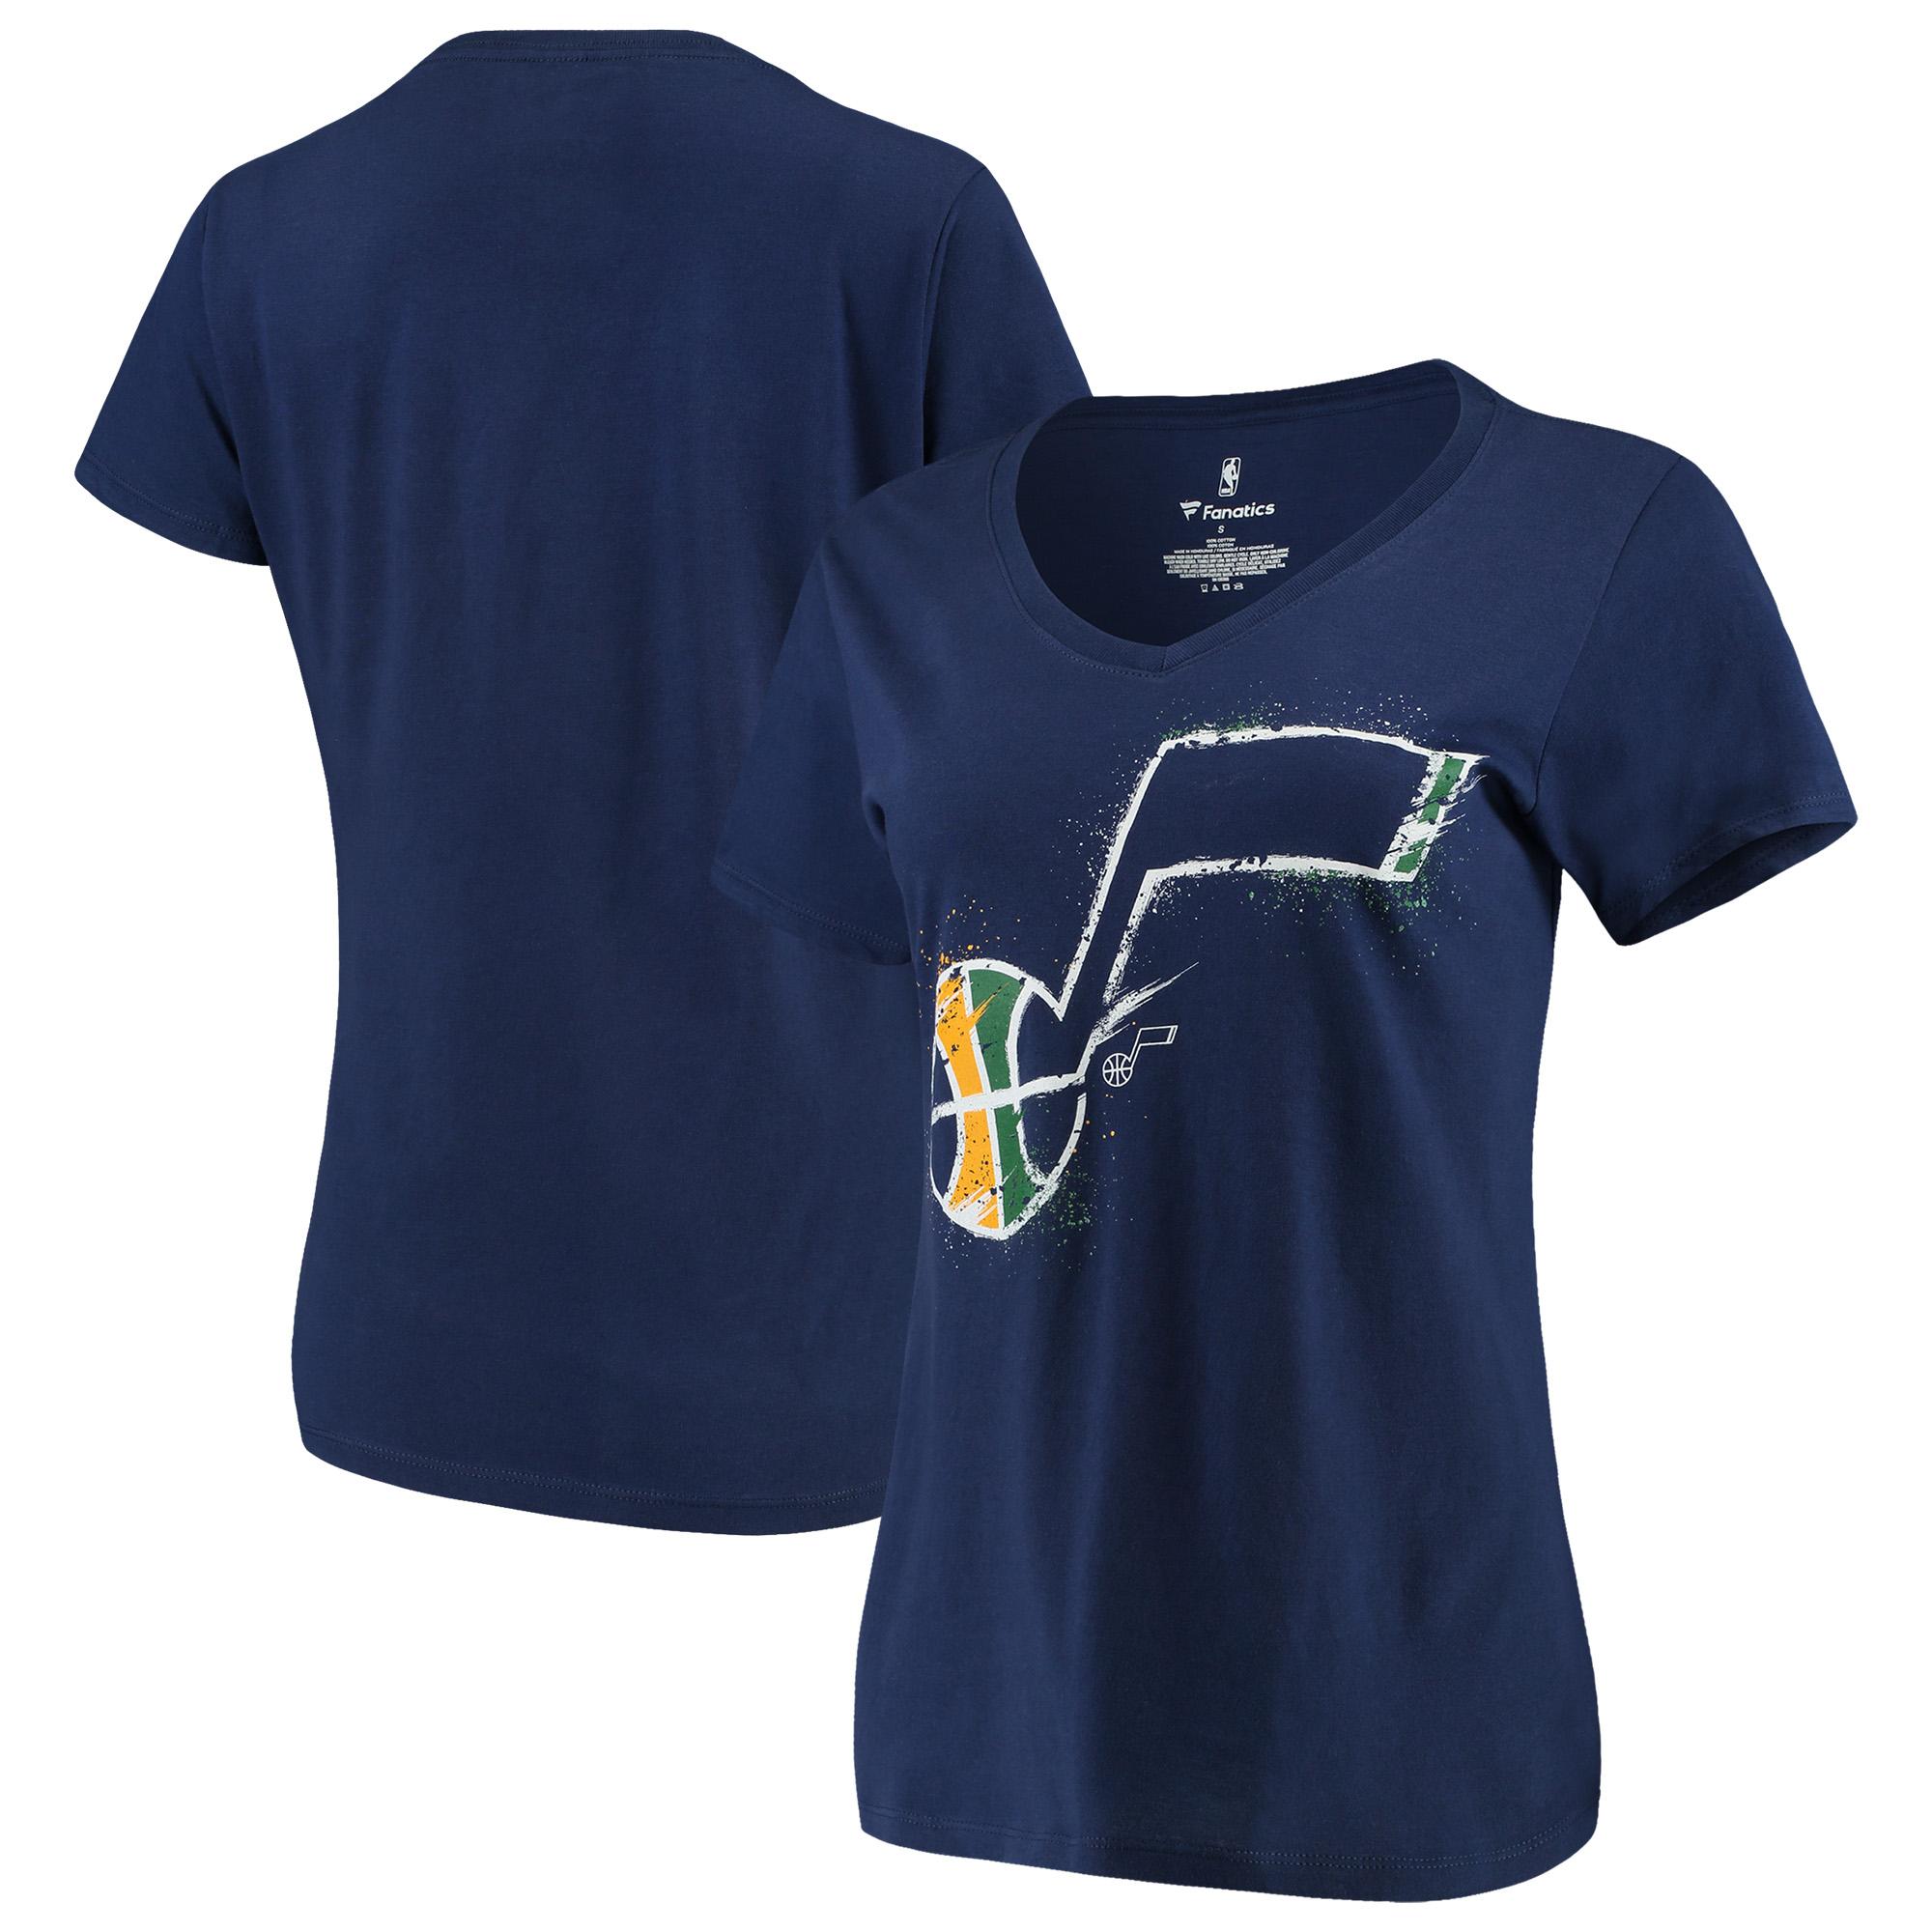 Utah Jazz Fanatics Branded Women's Splatter Logo V-Neck T-Shirt - Navy